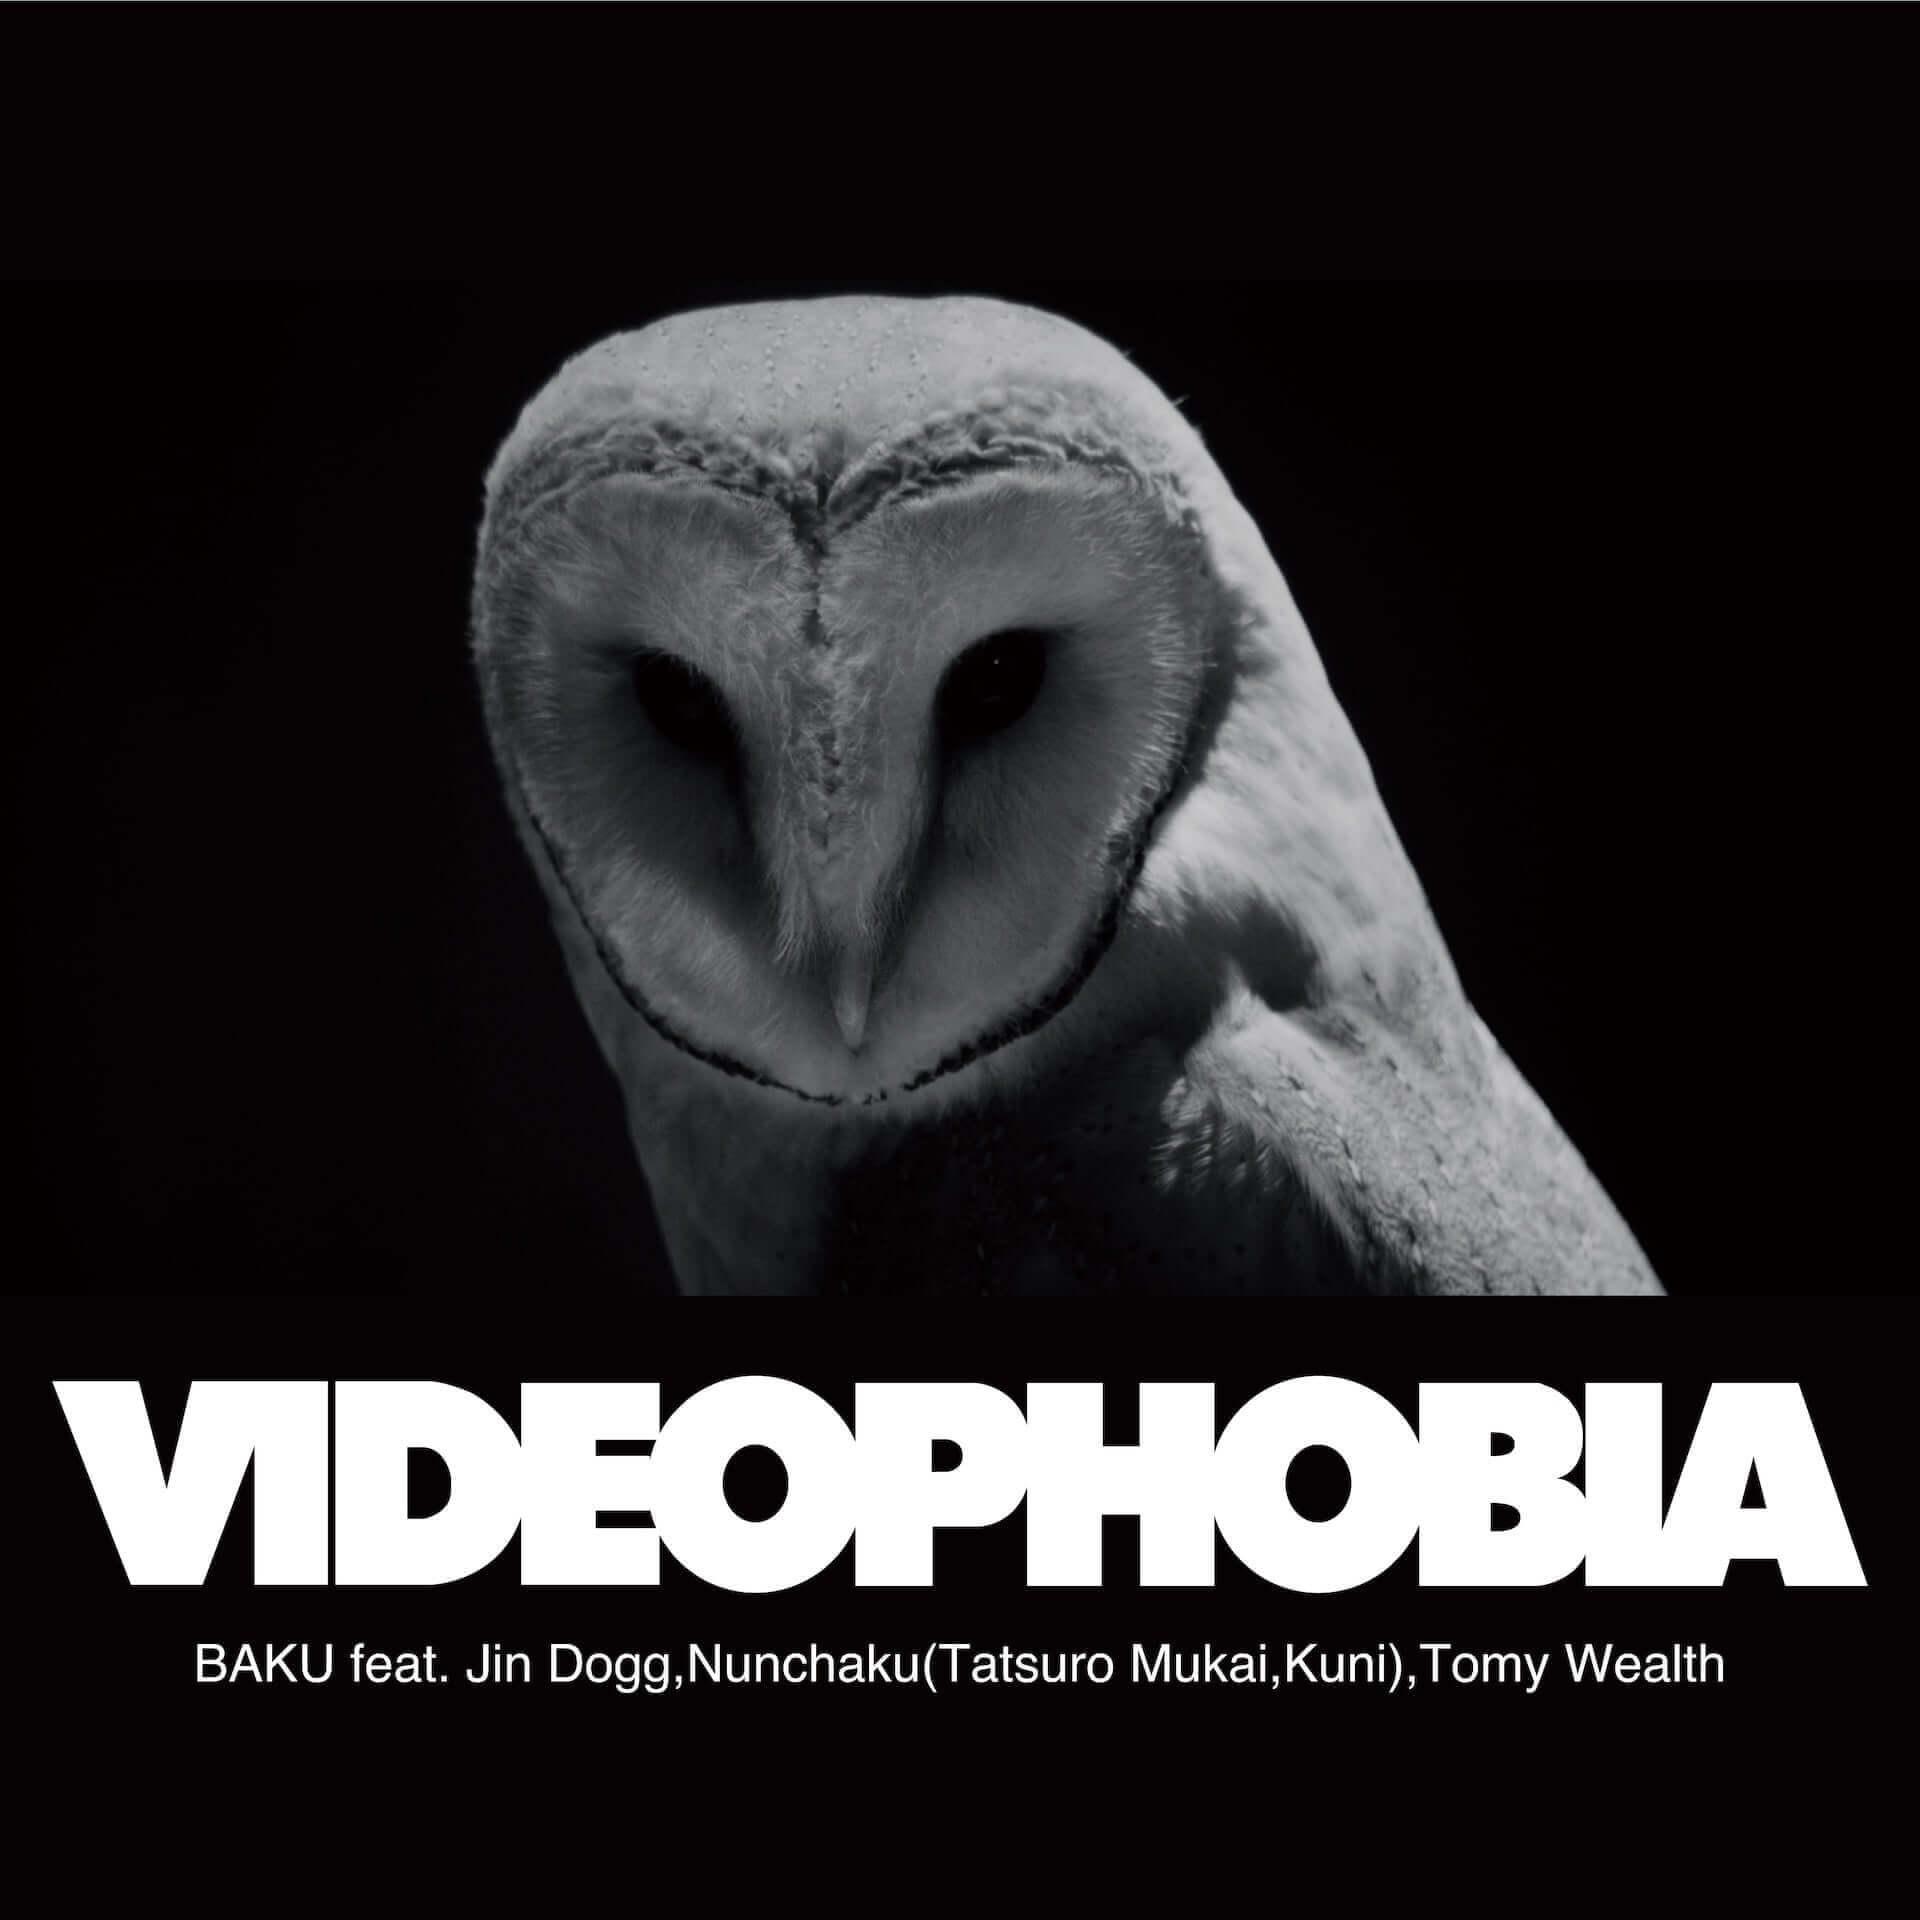 BAKUが音楽を担当した映画『VIDEOPHOBIA』の公開記念イベントが渋谷Contactにて開催決定!Tomy Wealth、KILLER-BONGらが出演 music201030_contact-videophobia_4-1920x1920